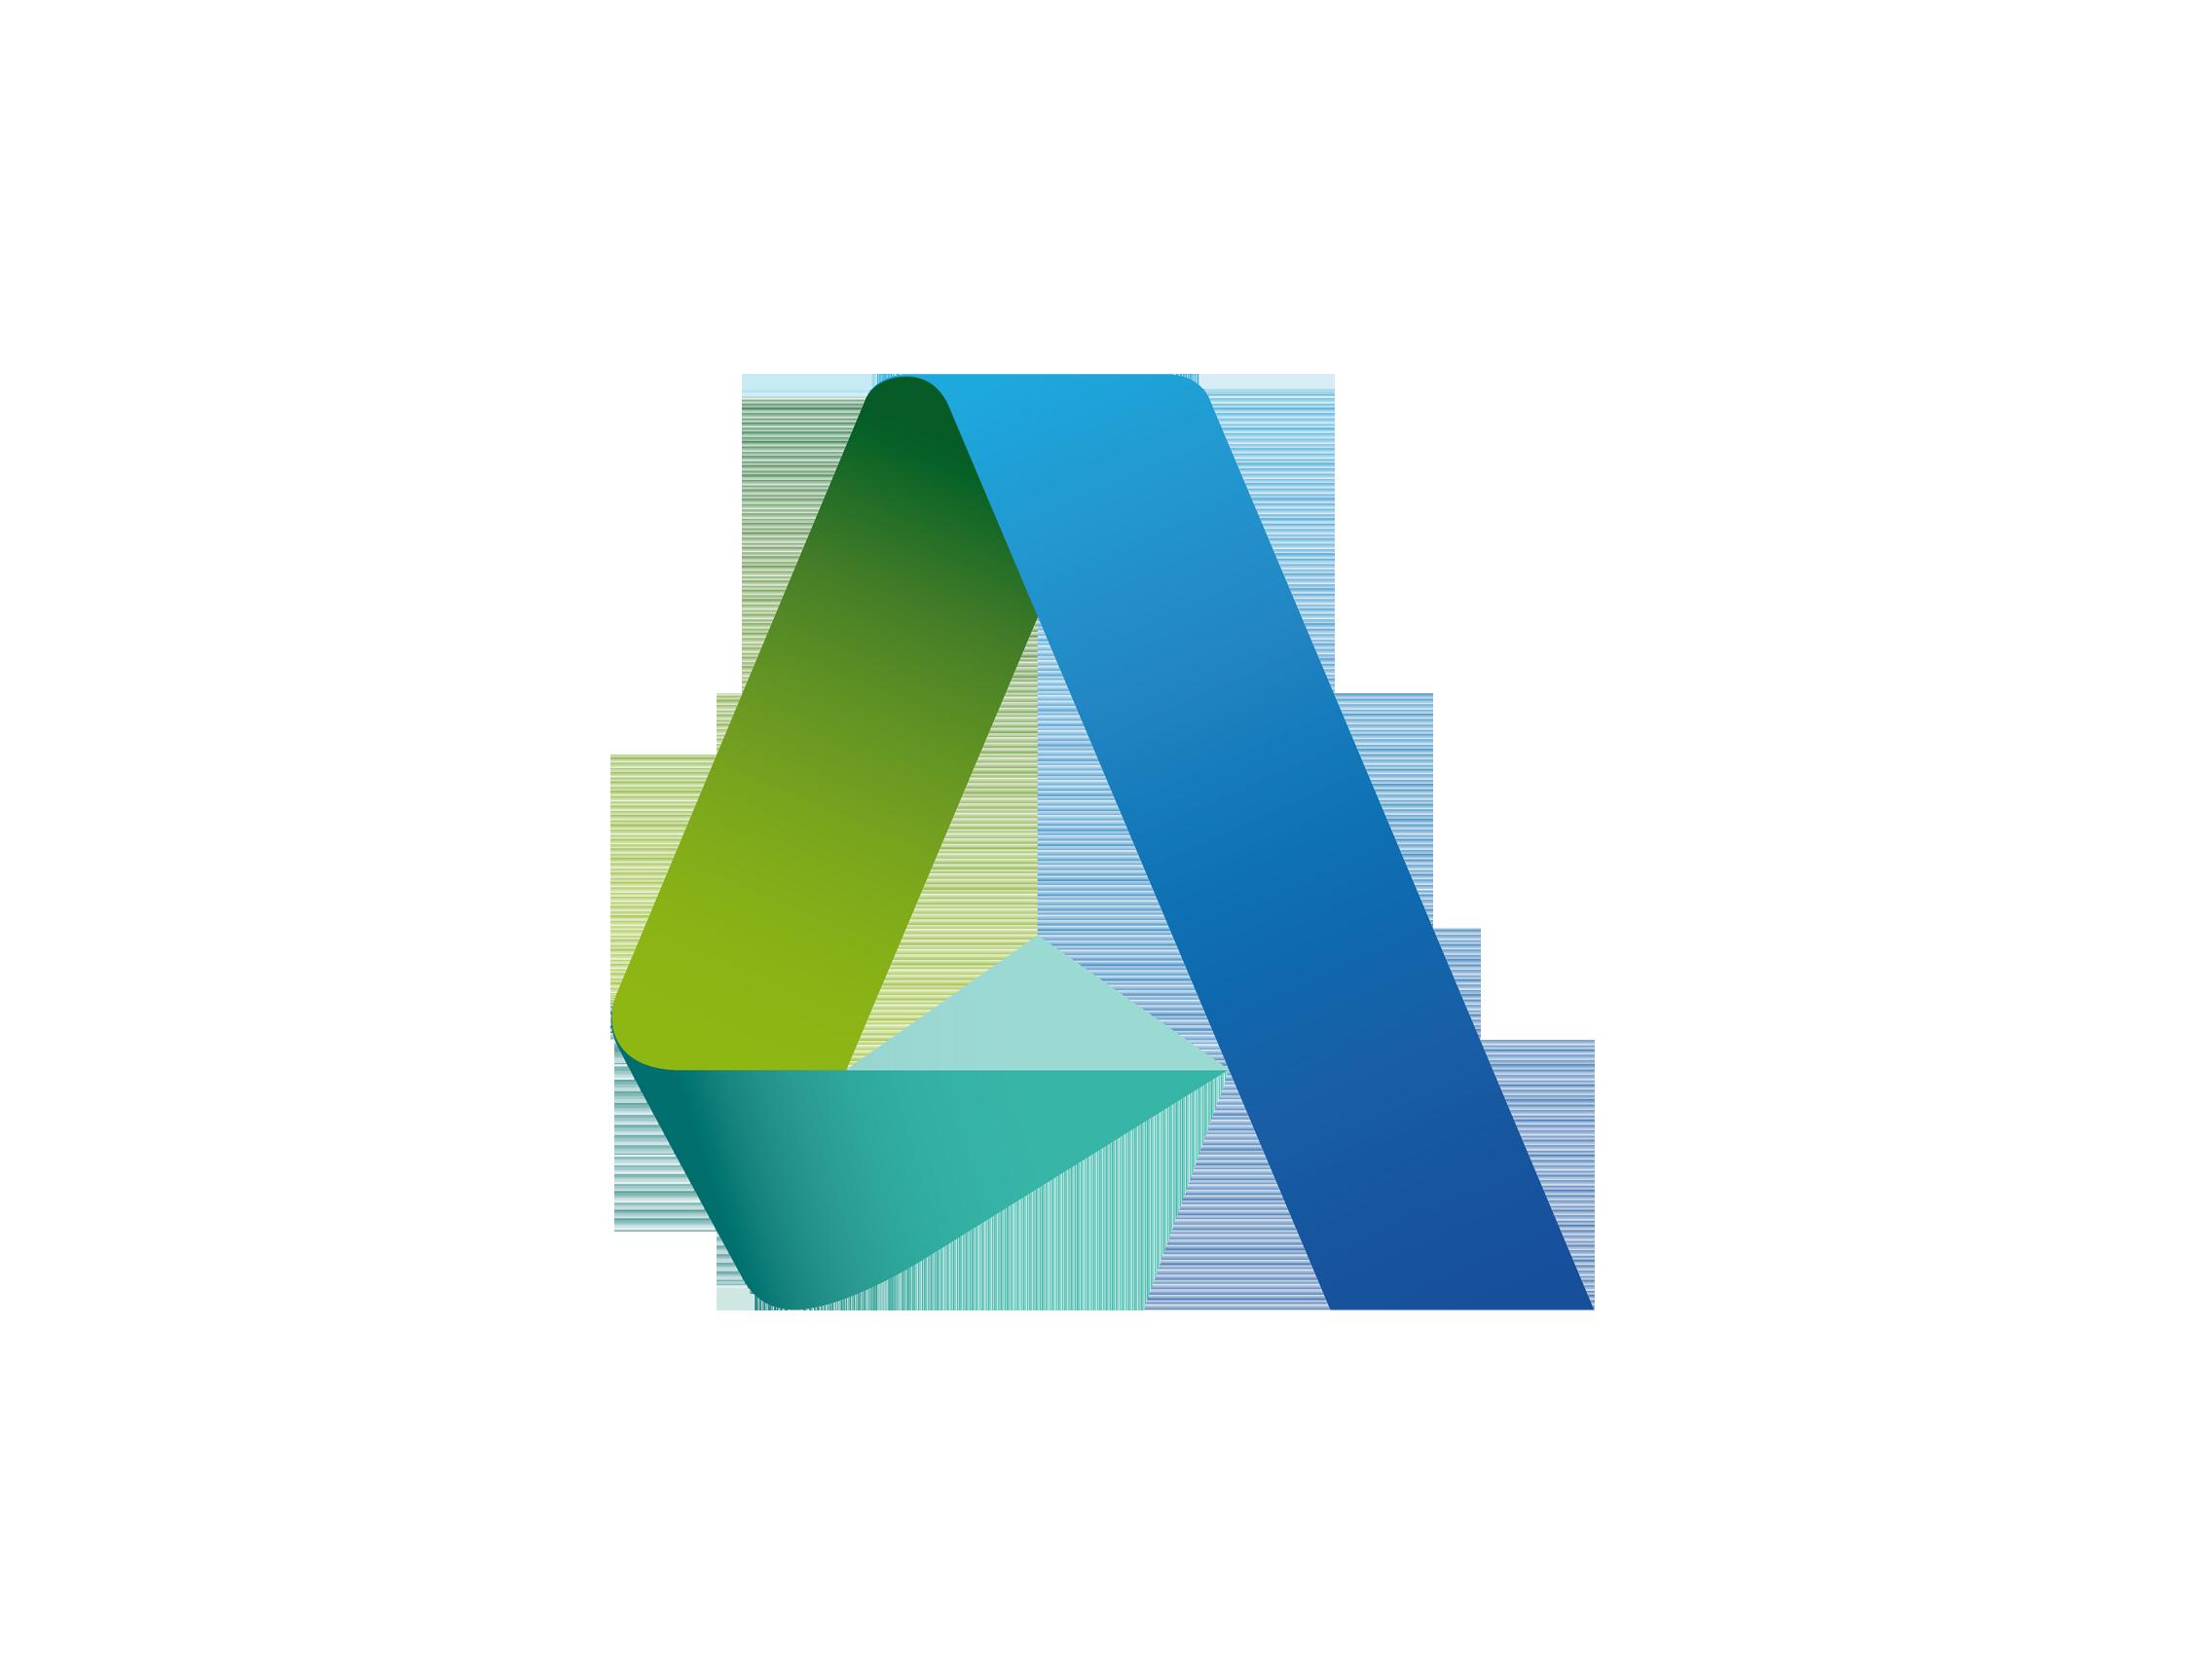 Autodesk Logo Wallpaper